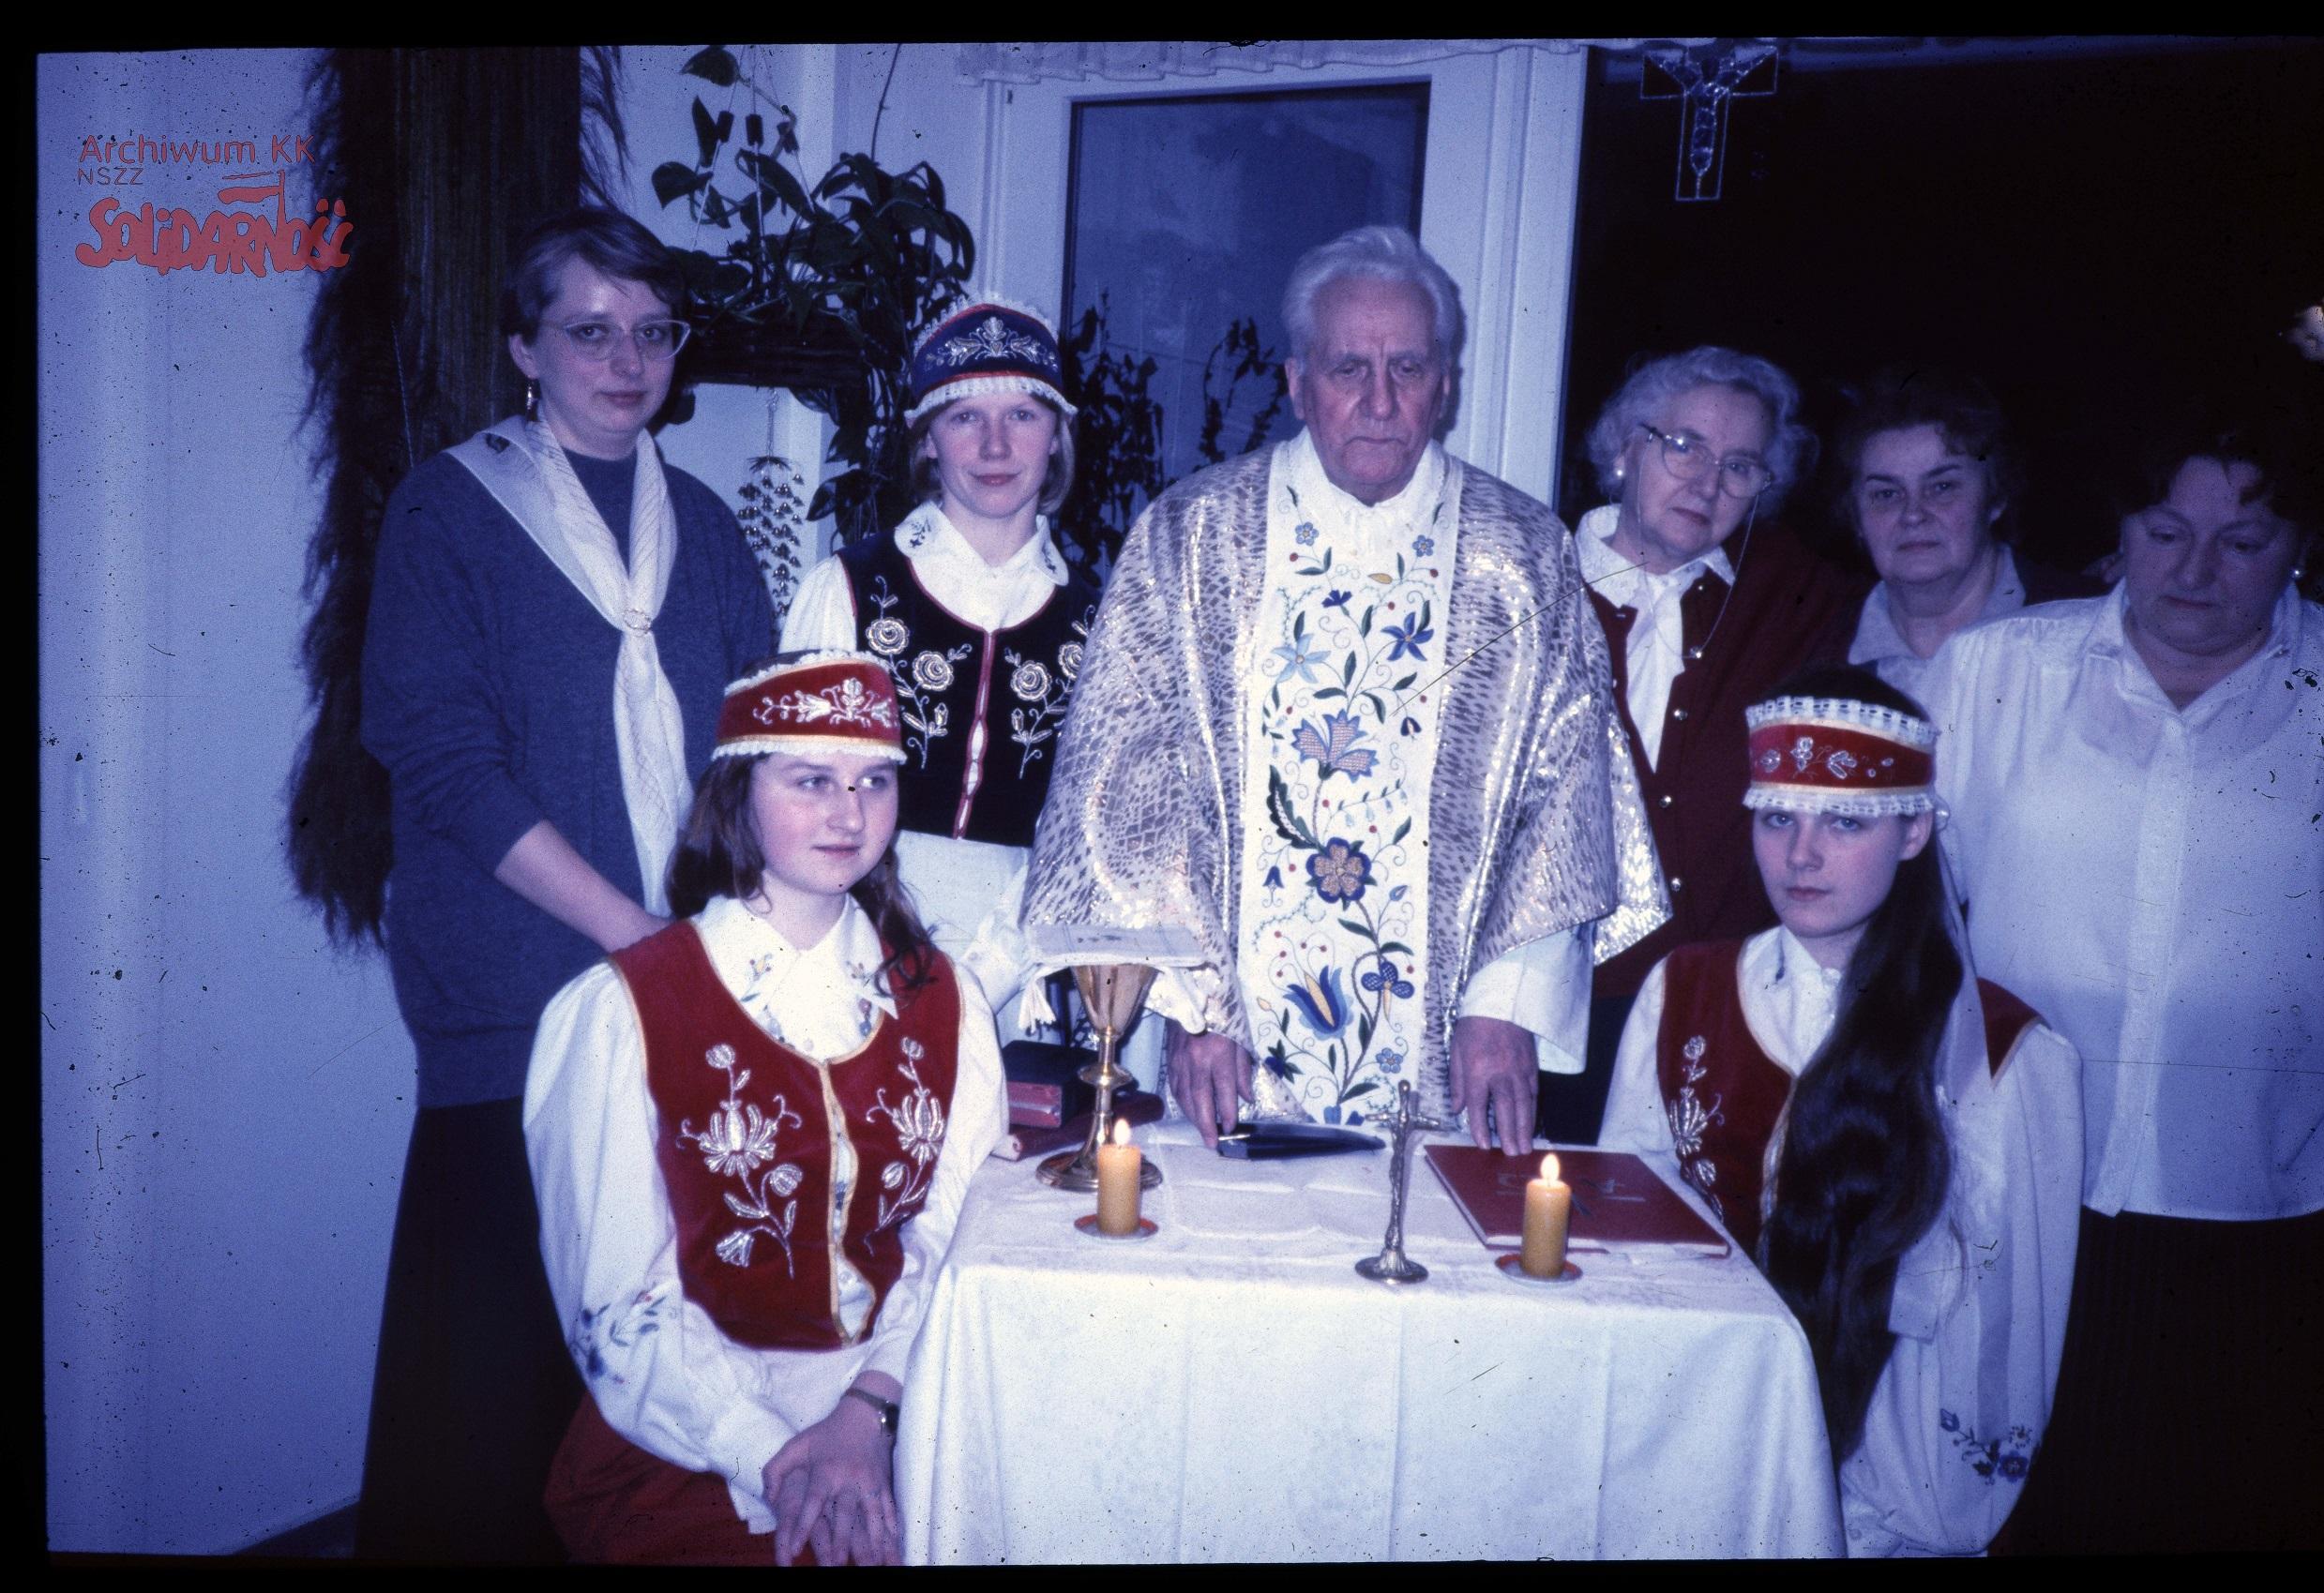 AKKS-347-79-119-003-B Priest Prelate Hilary Jastak